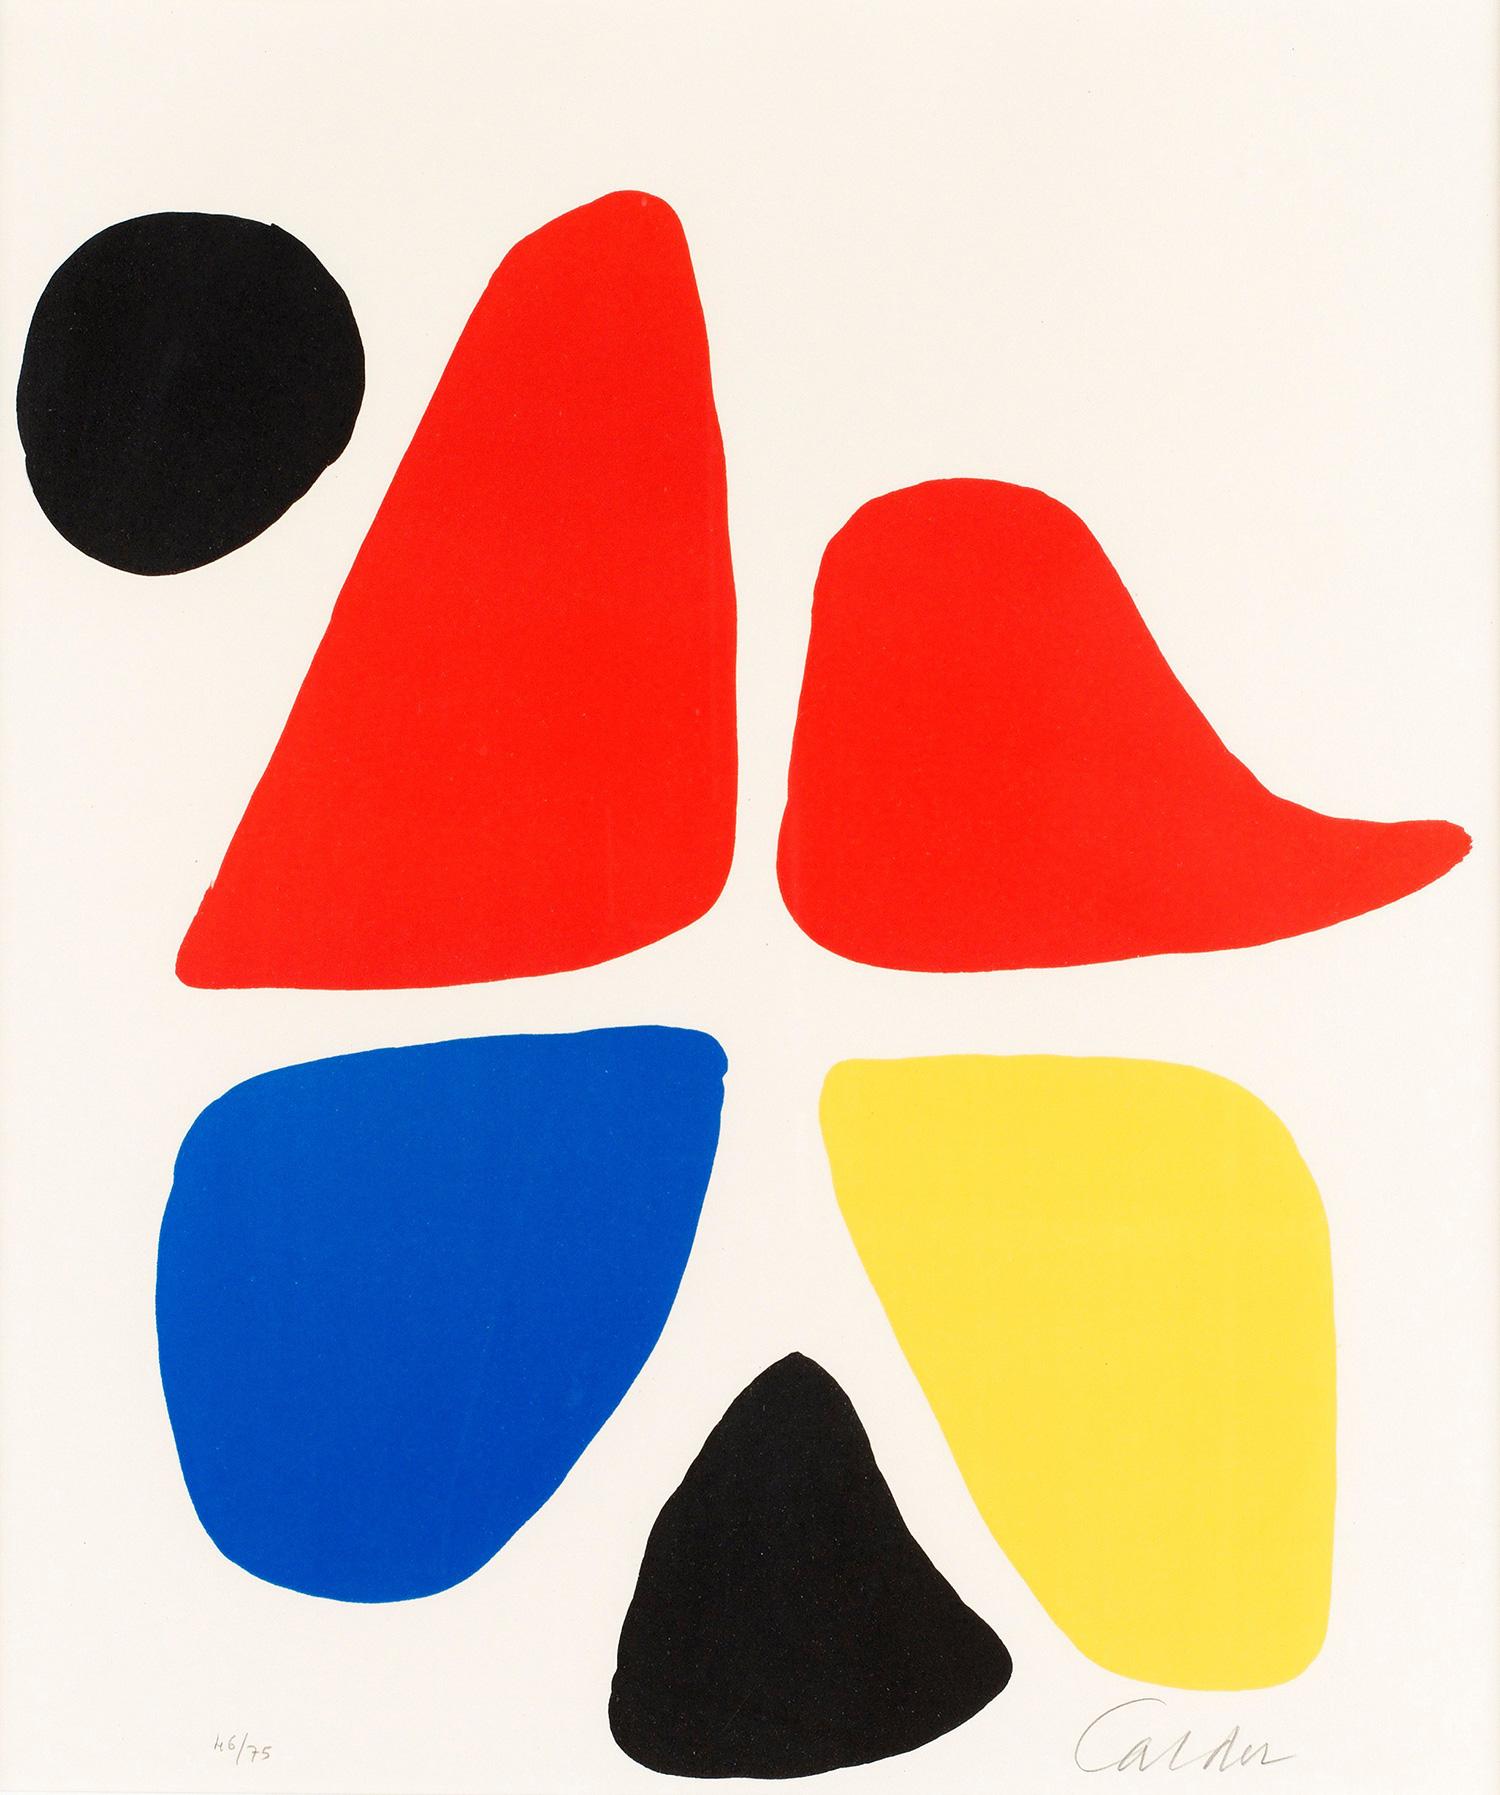 Alexander Calder |American Sculptor